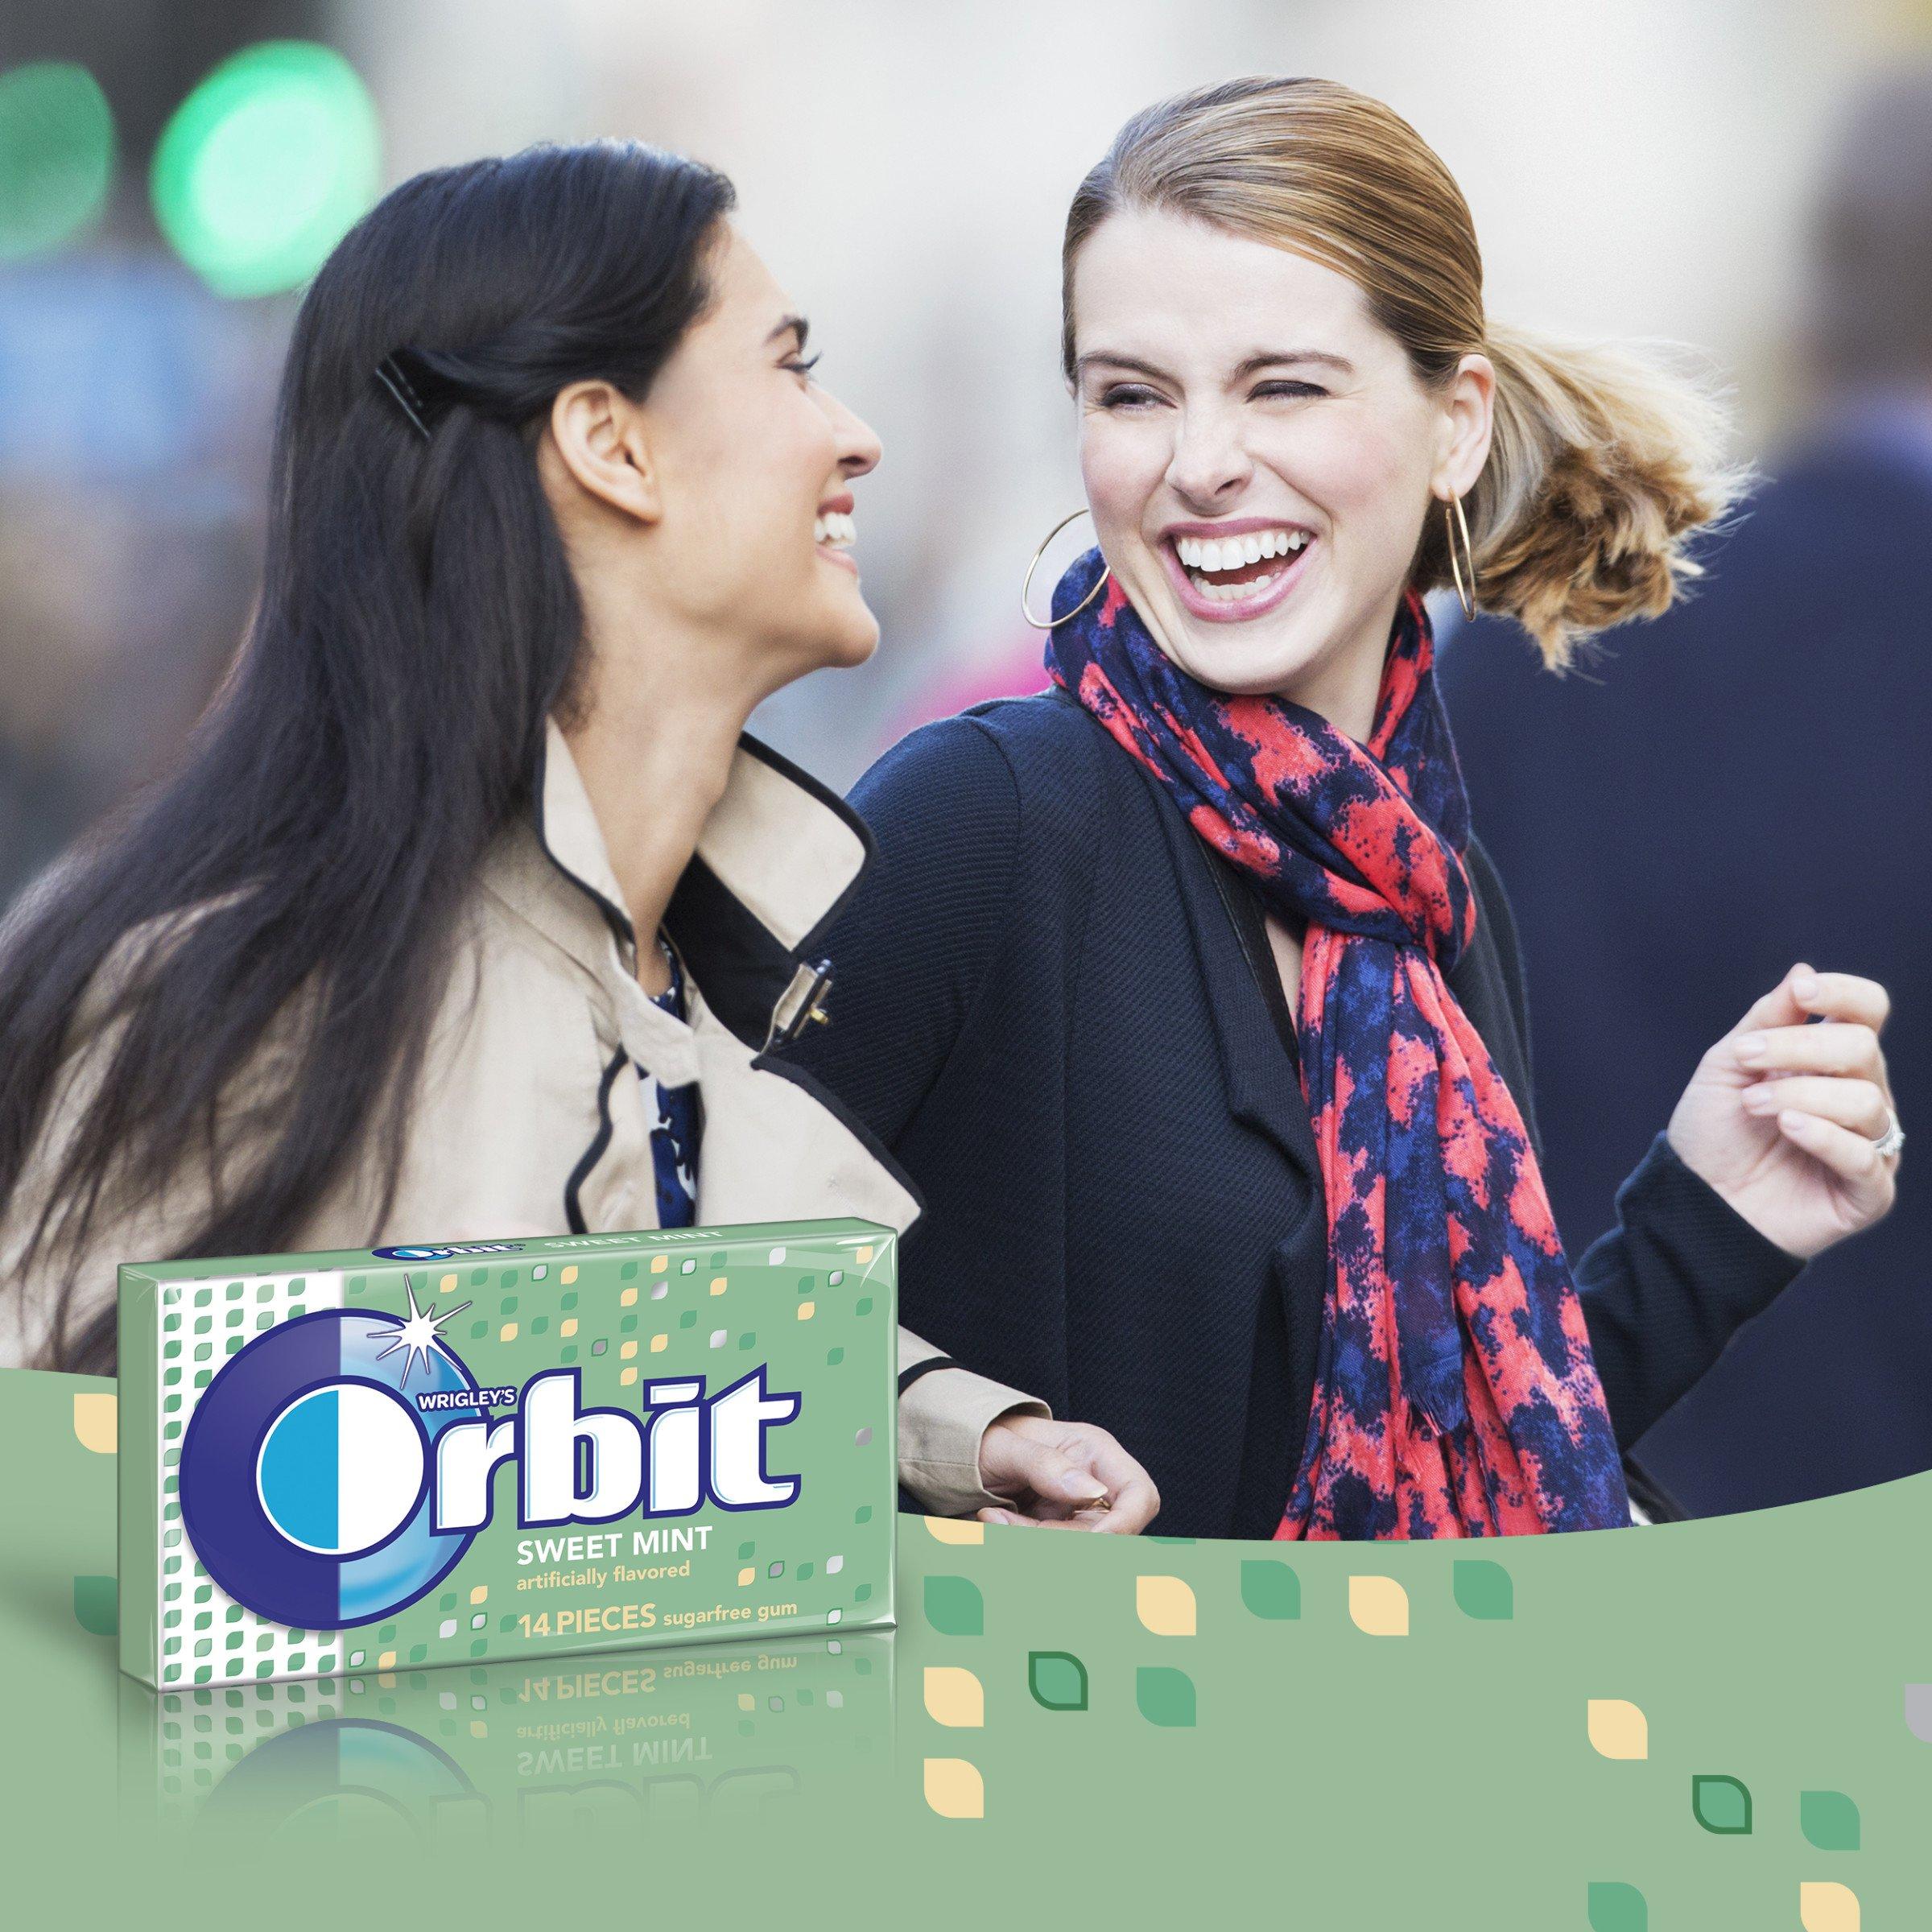 Orbit Sweet Mint Sugarfree Gum, 8 Count (Pack of 6) by Orbit Gum (Image #6)